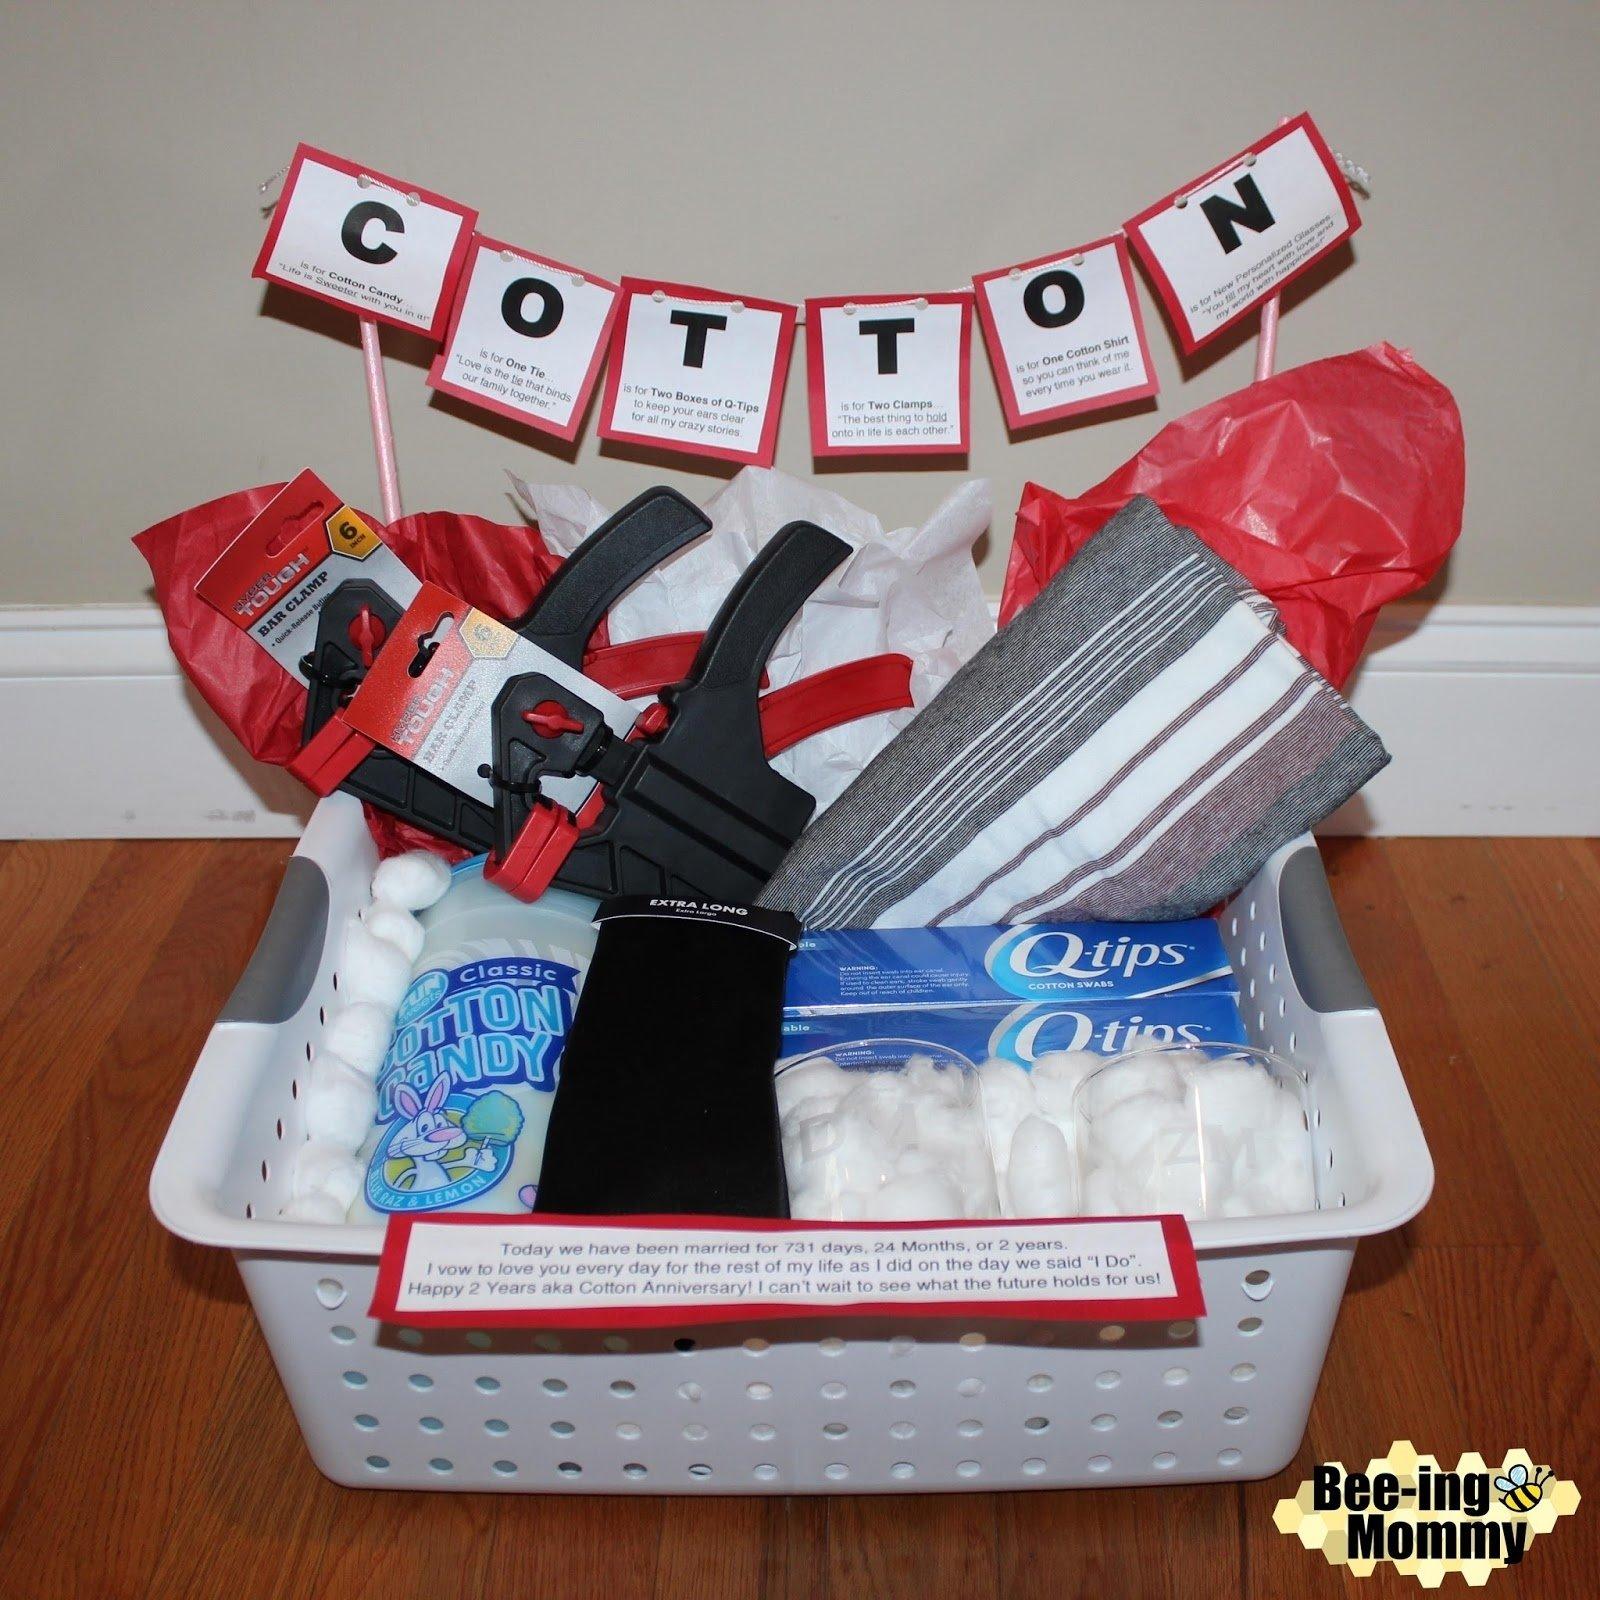 10 Elegant Cotton Anniversary Gift Ideas For Him bee ing mommy blog cotton anniversary gift basket plus several more 2020